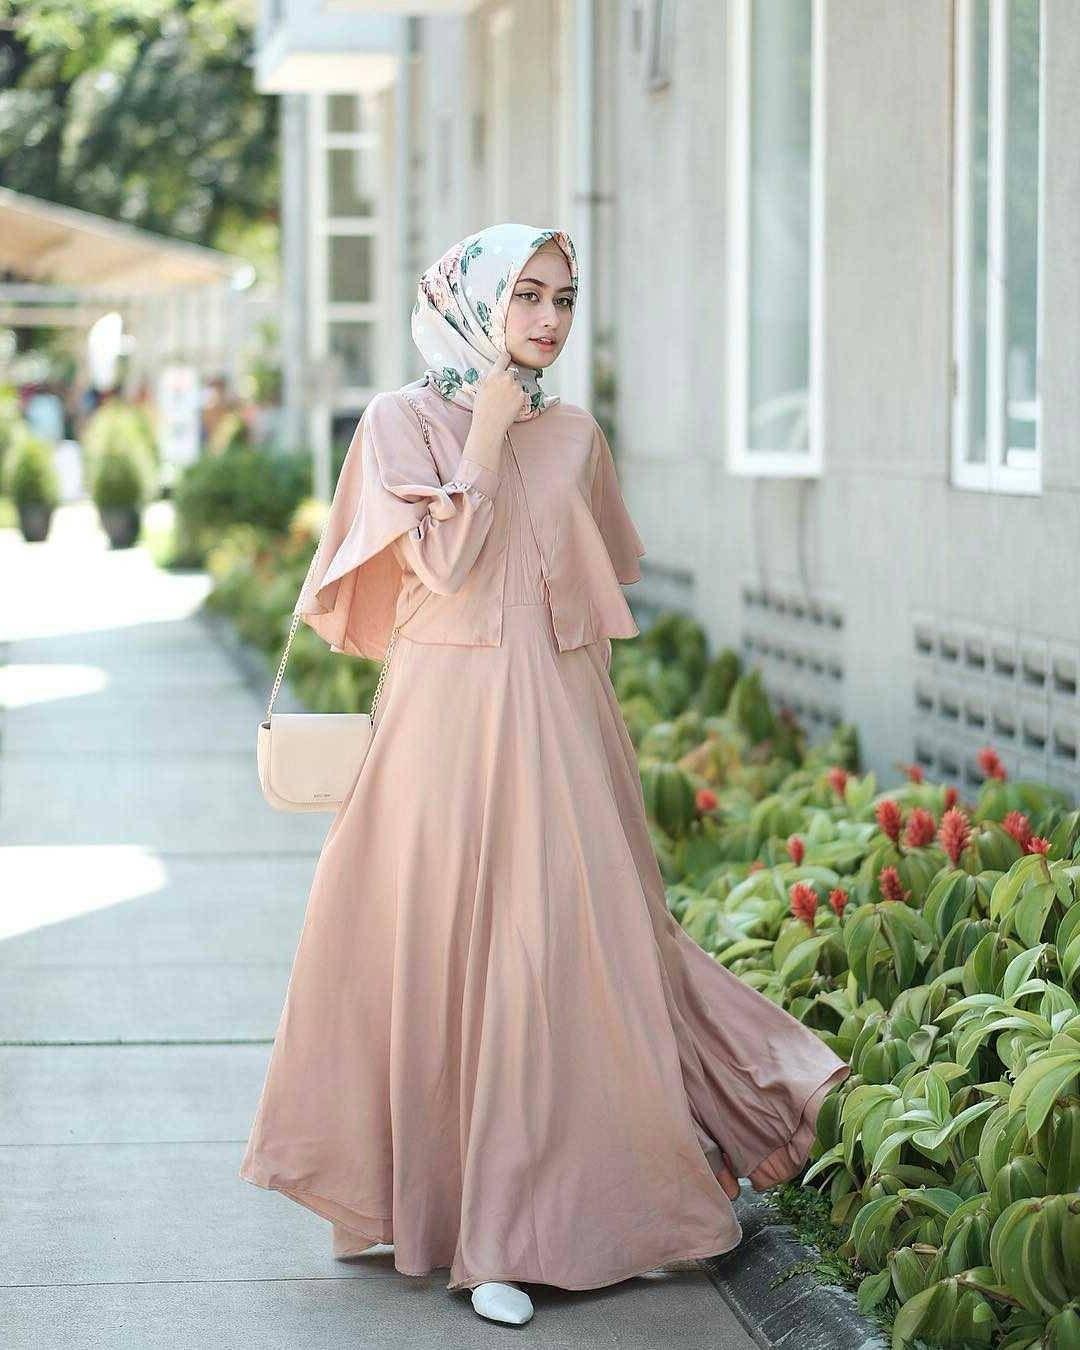 Bentuk Fashion Baju Lebaran Dwdk Model Baju Gamis Terbaru Lebaran Gambar islami